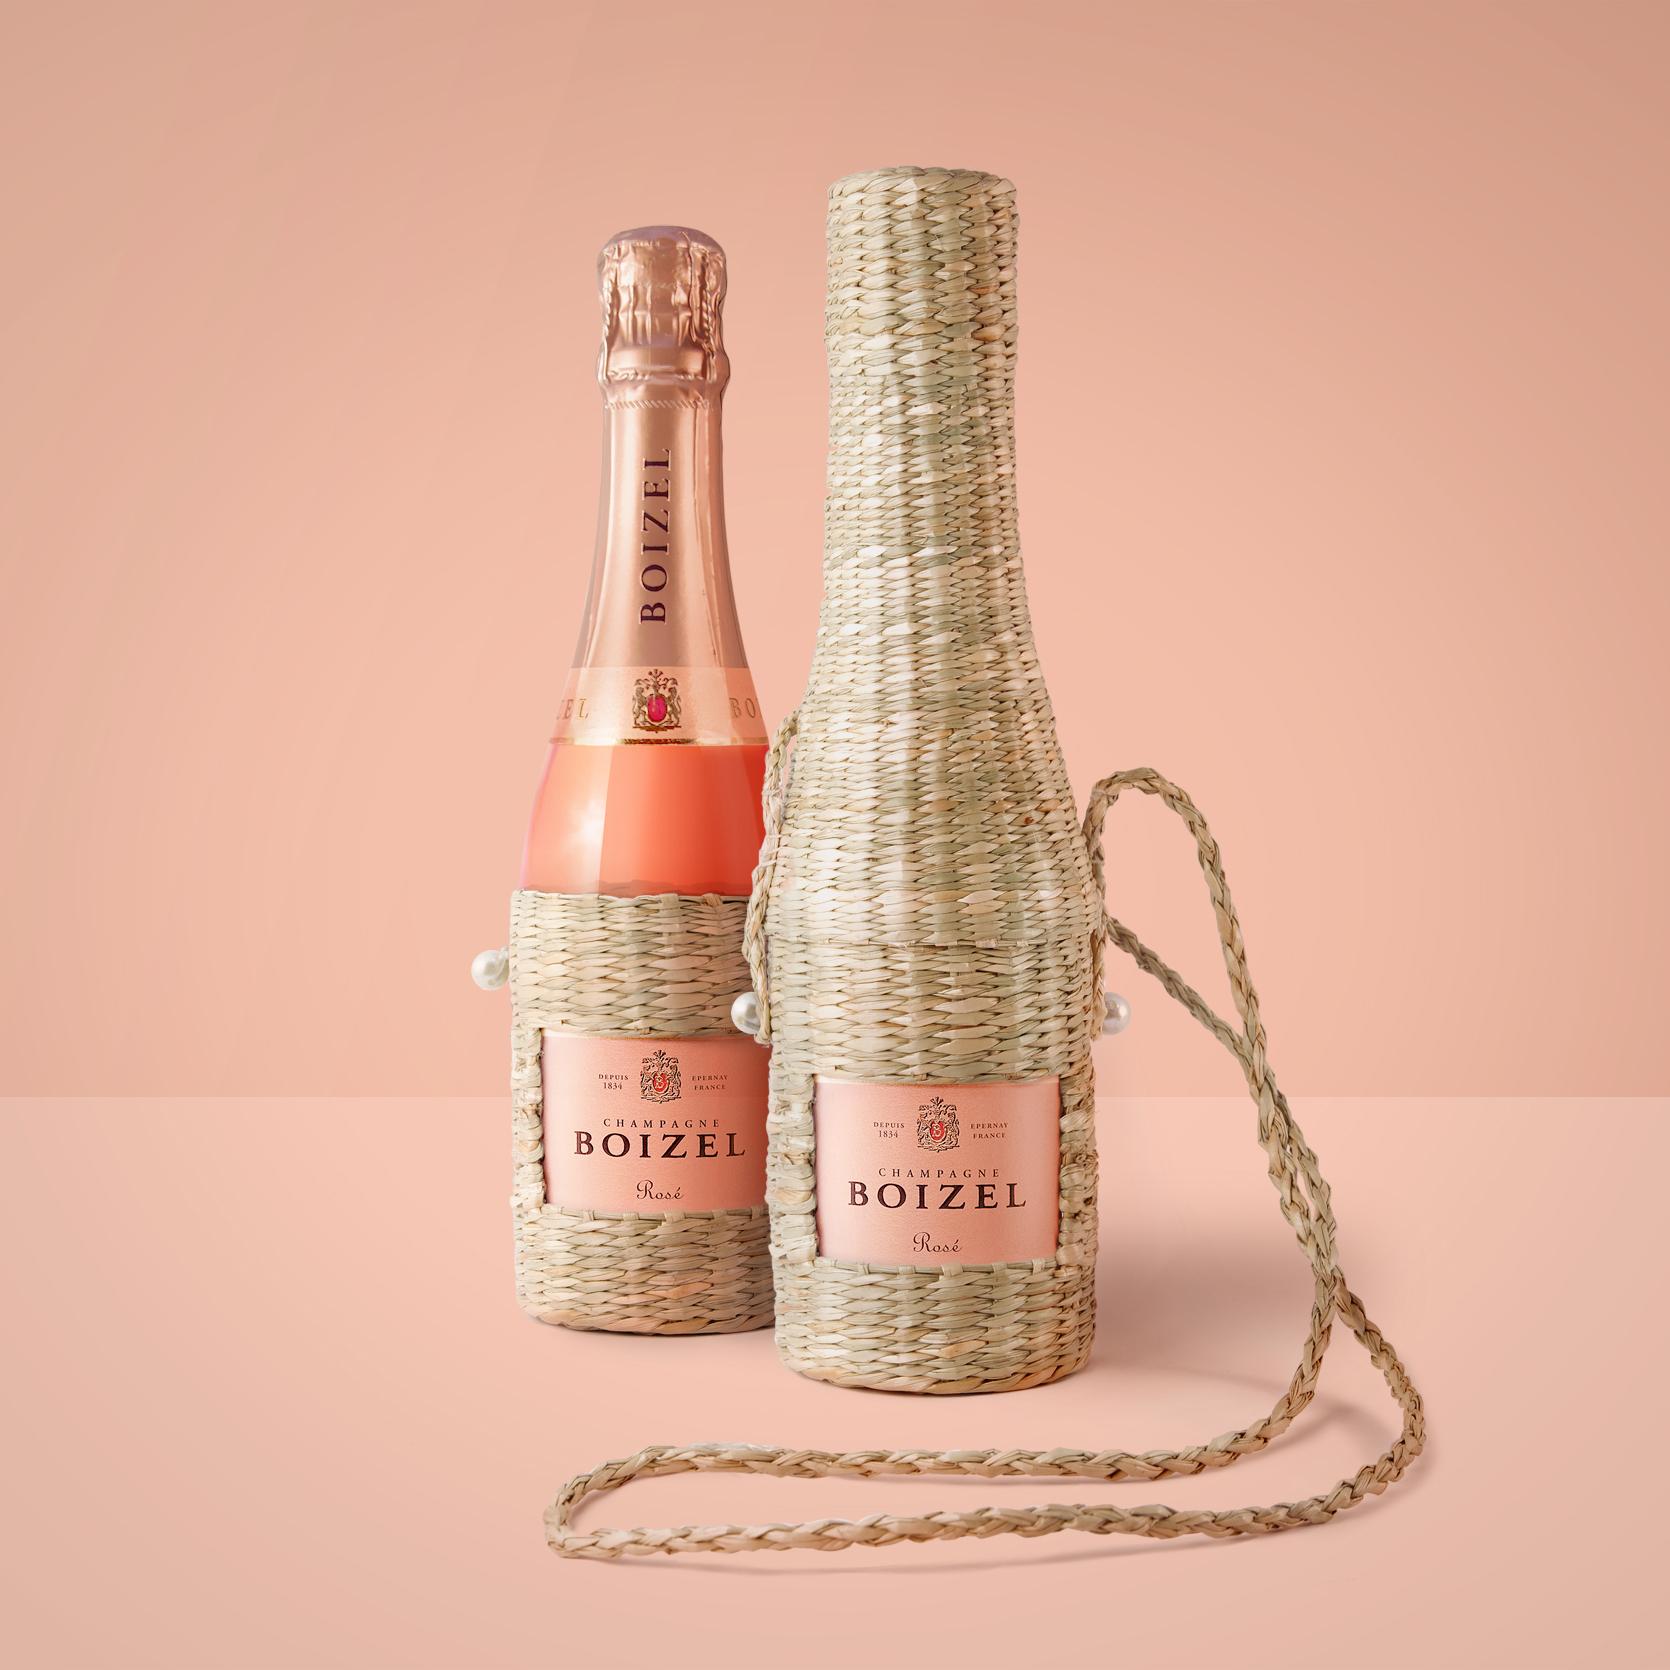 Pink Champagne Picnic-chic Pouch Designed by Delatour Design Paris